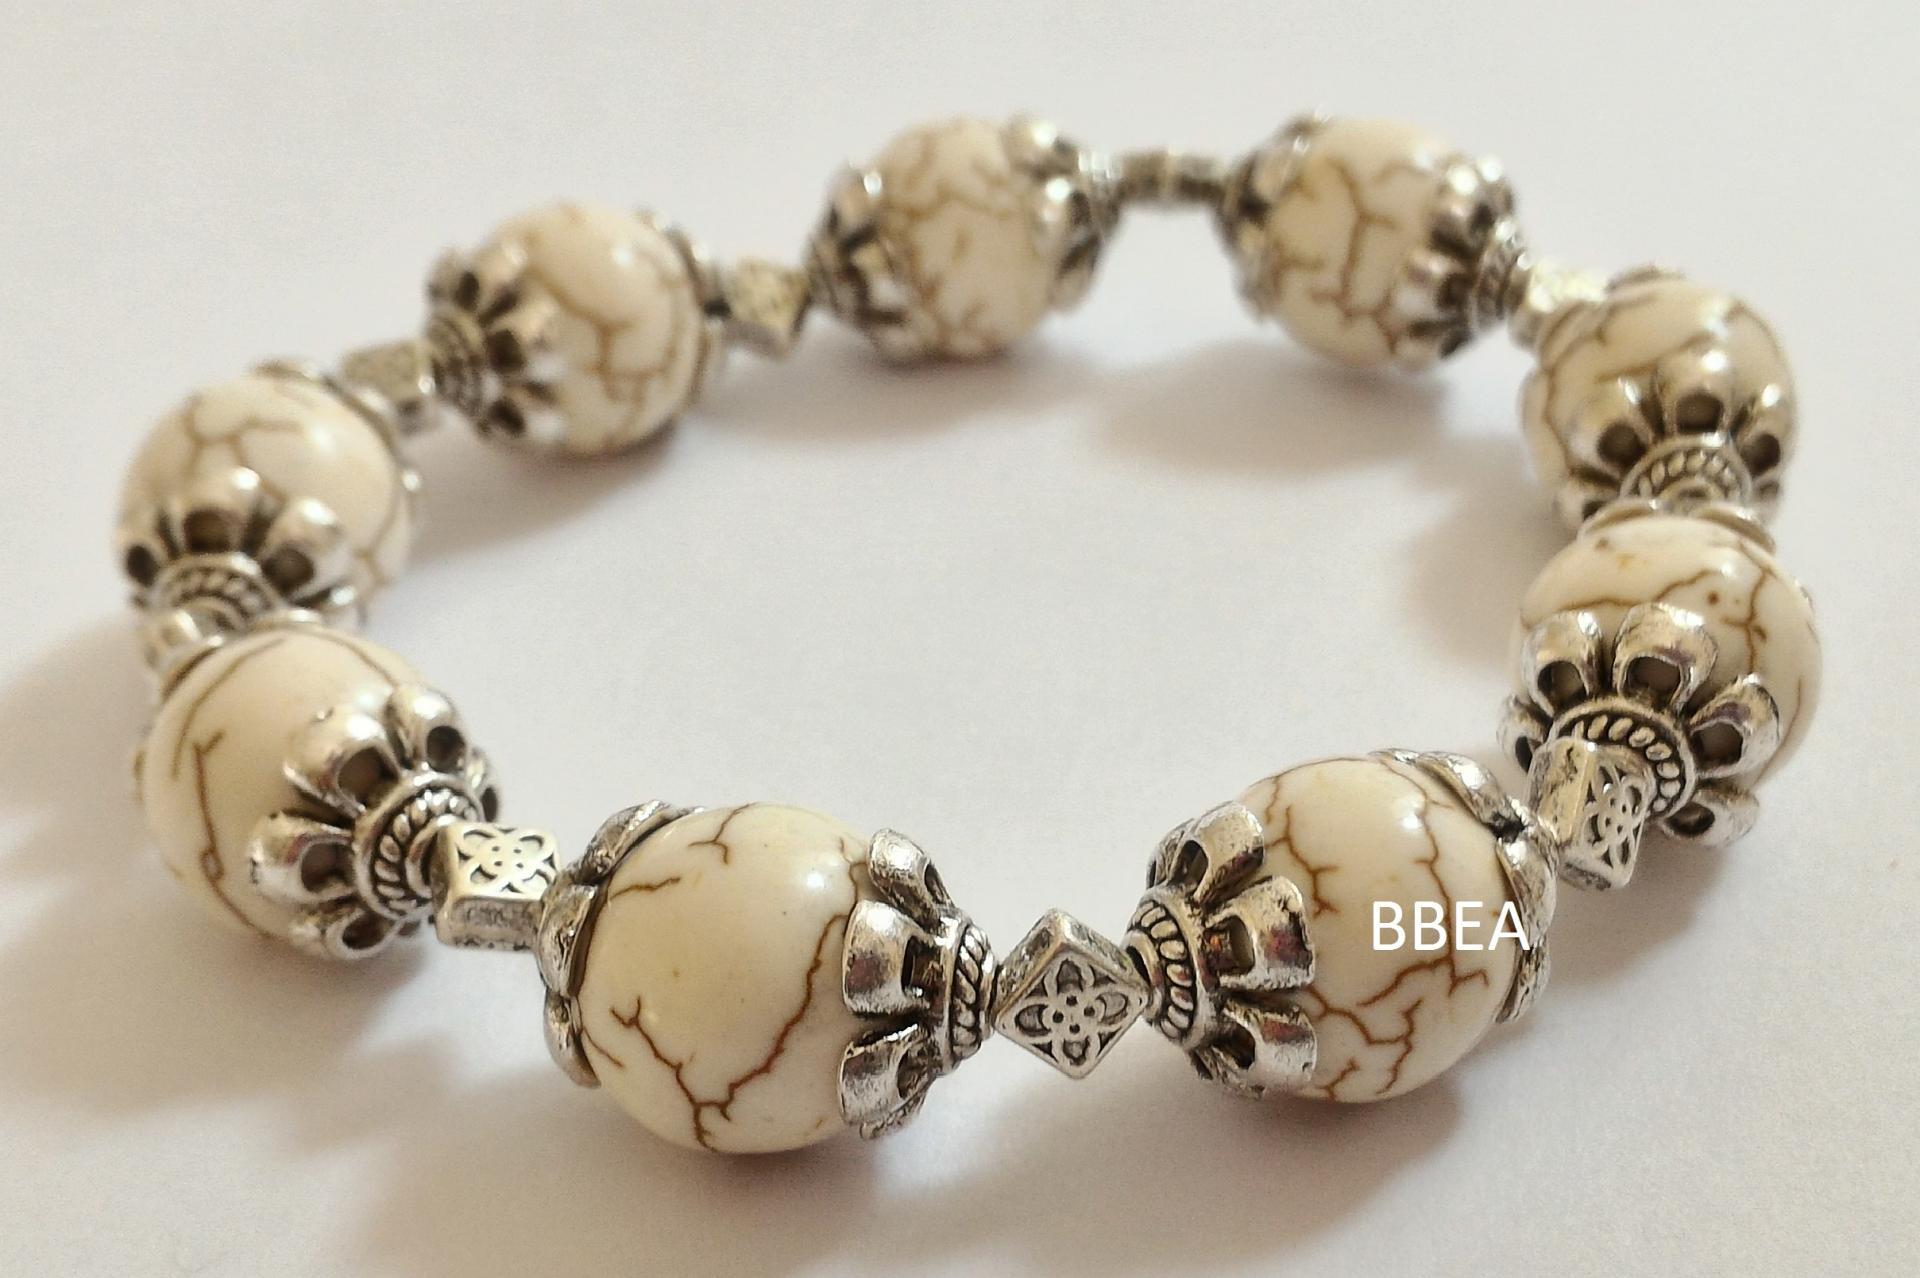 Bracelet magnesite 5 1